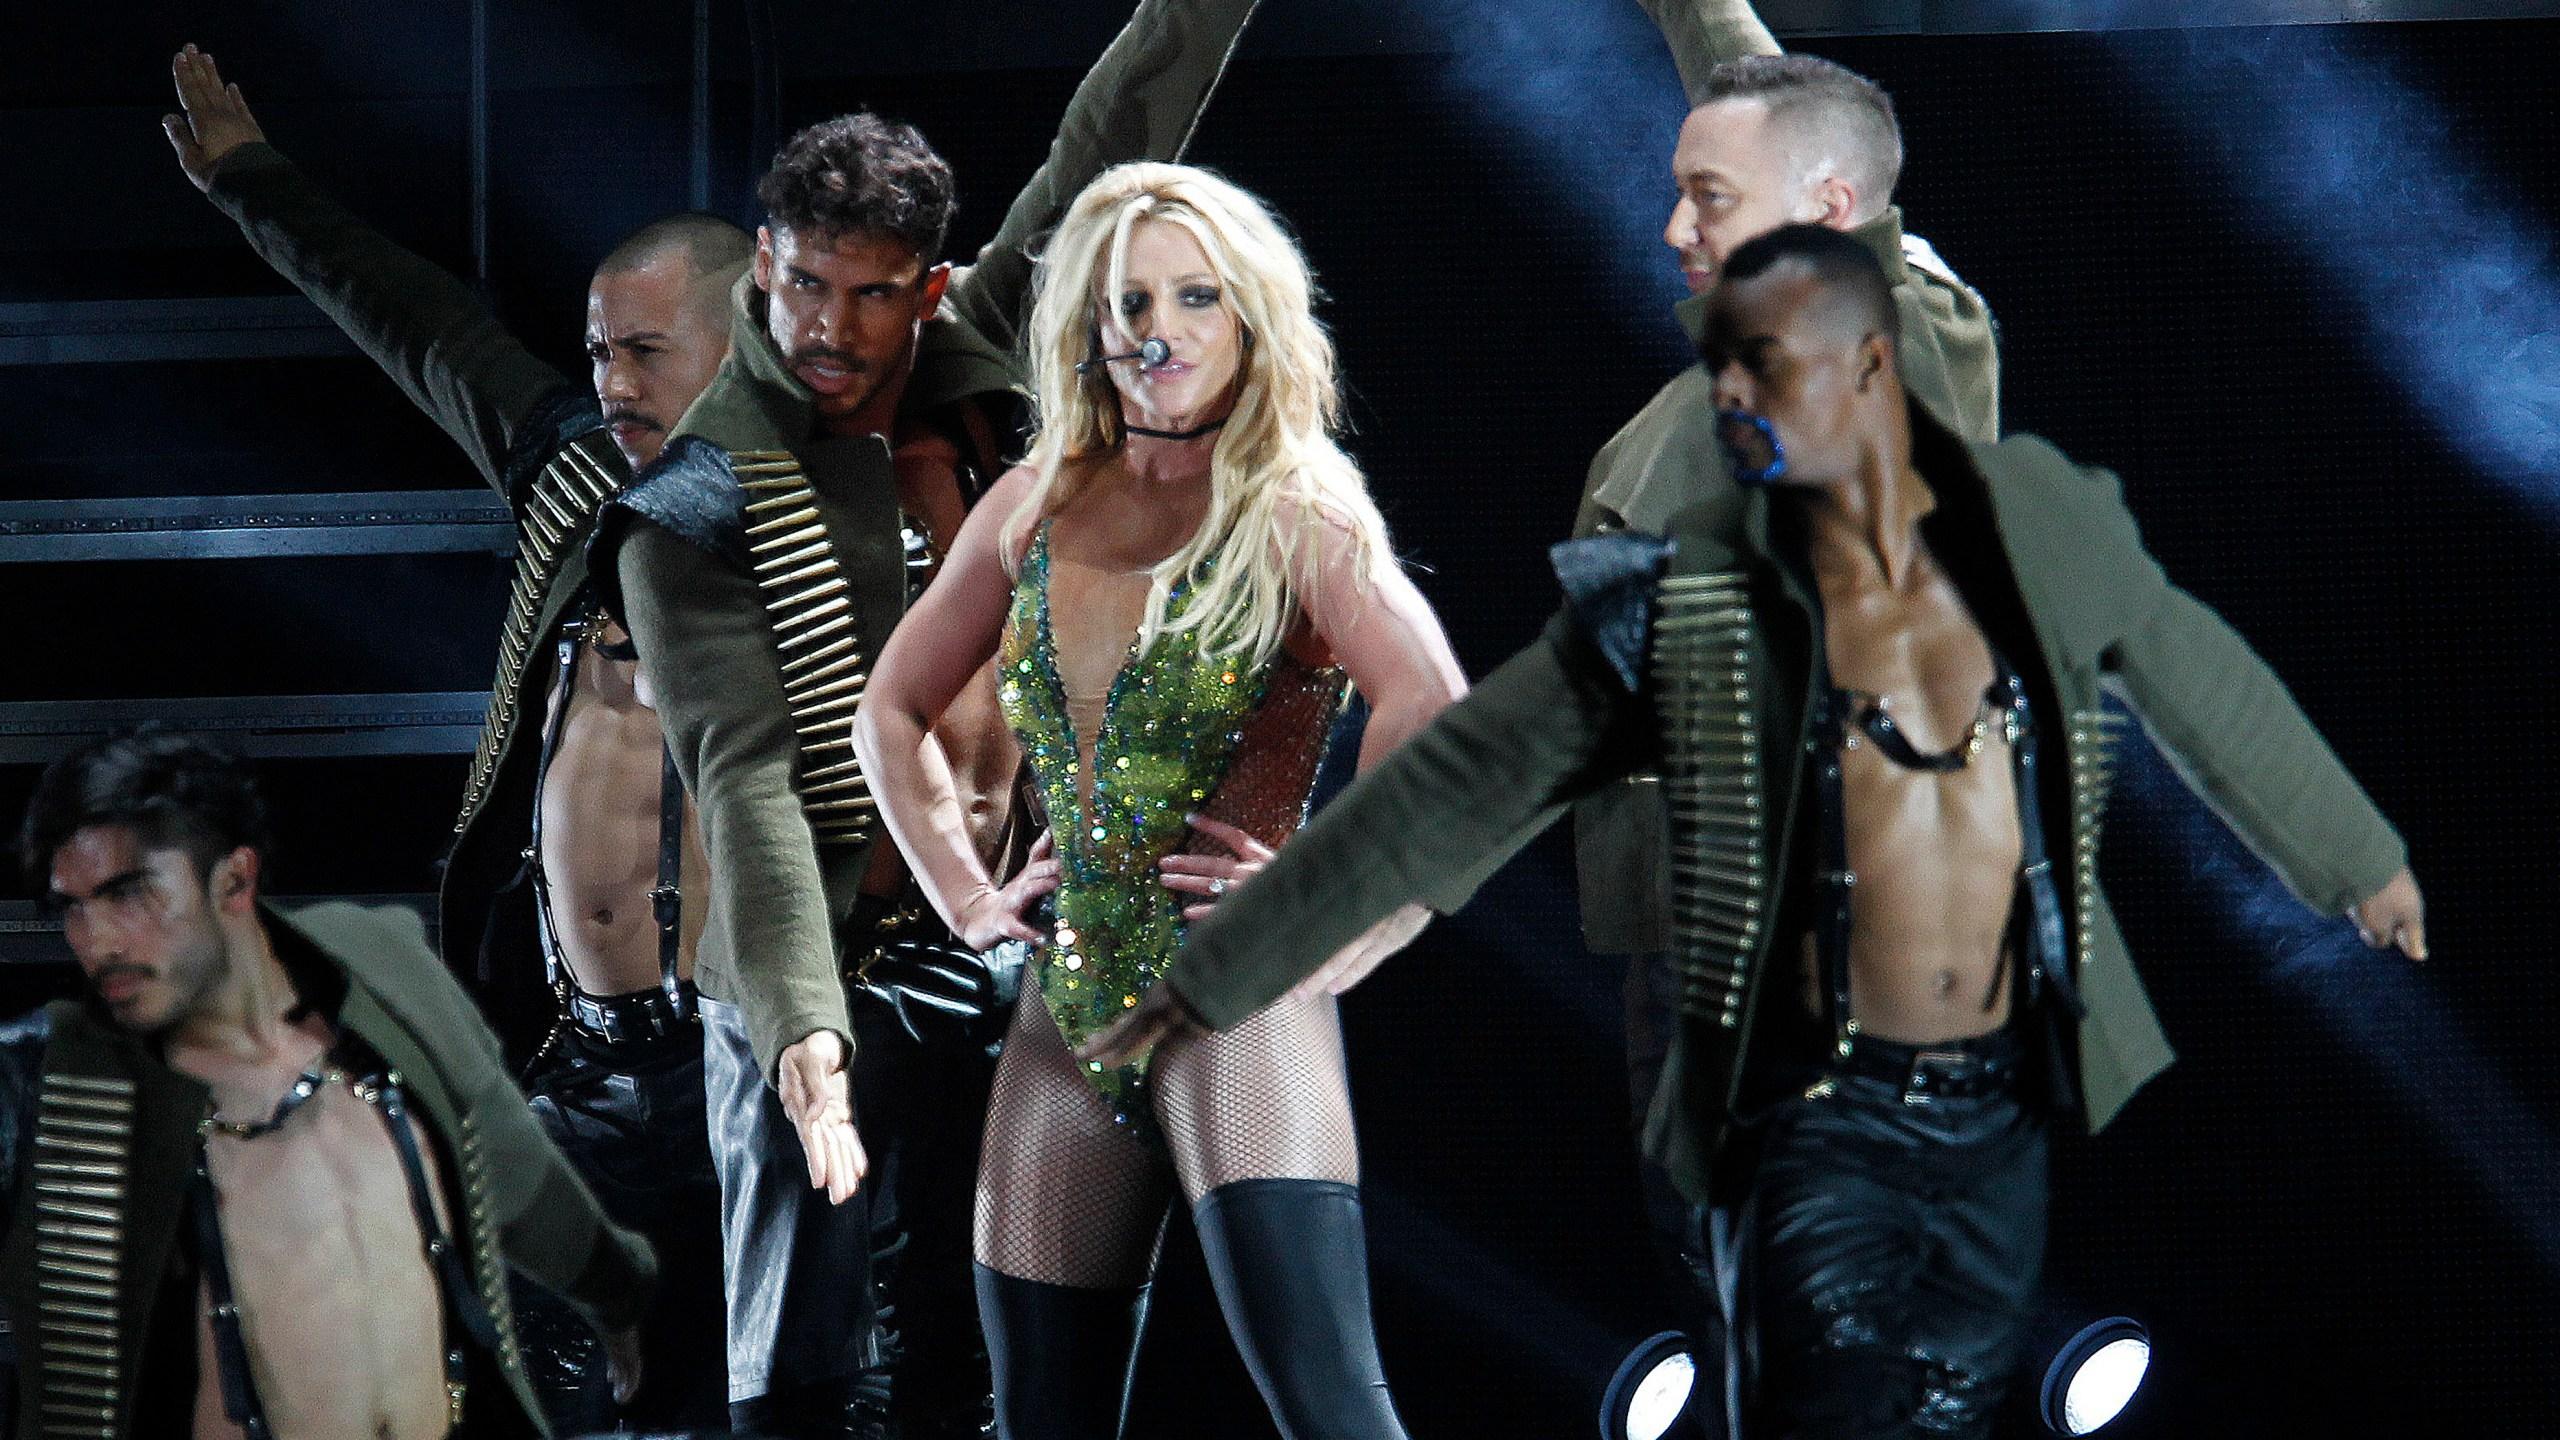 Music-Britney_Spears_63195-159532.jpg70409361